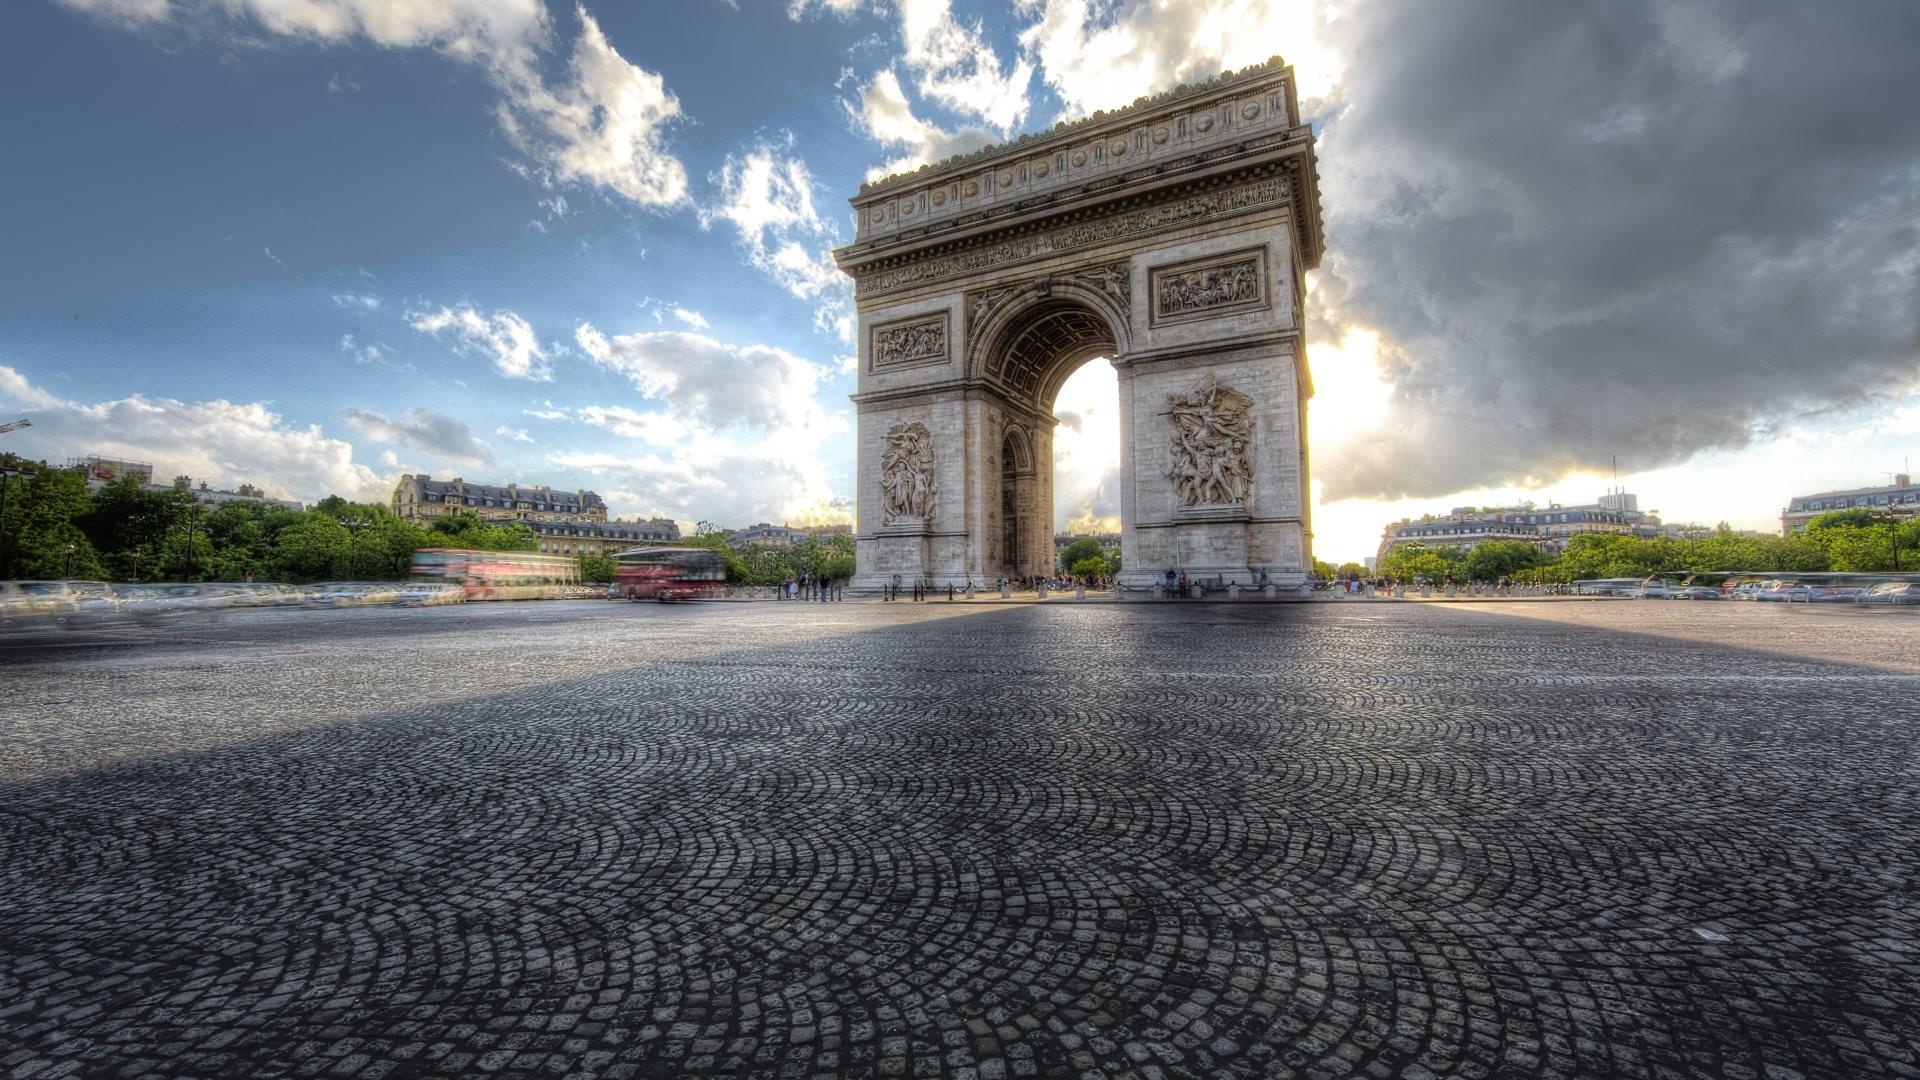 Arc De Triomphe desktop wallpaper hd